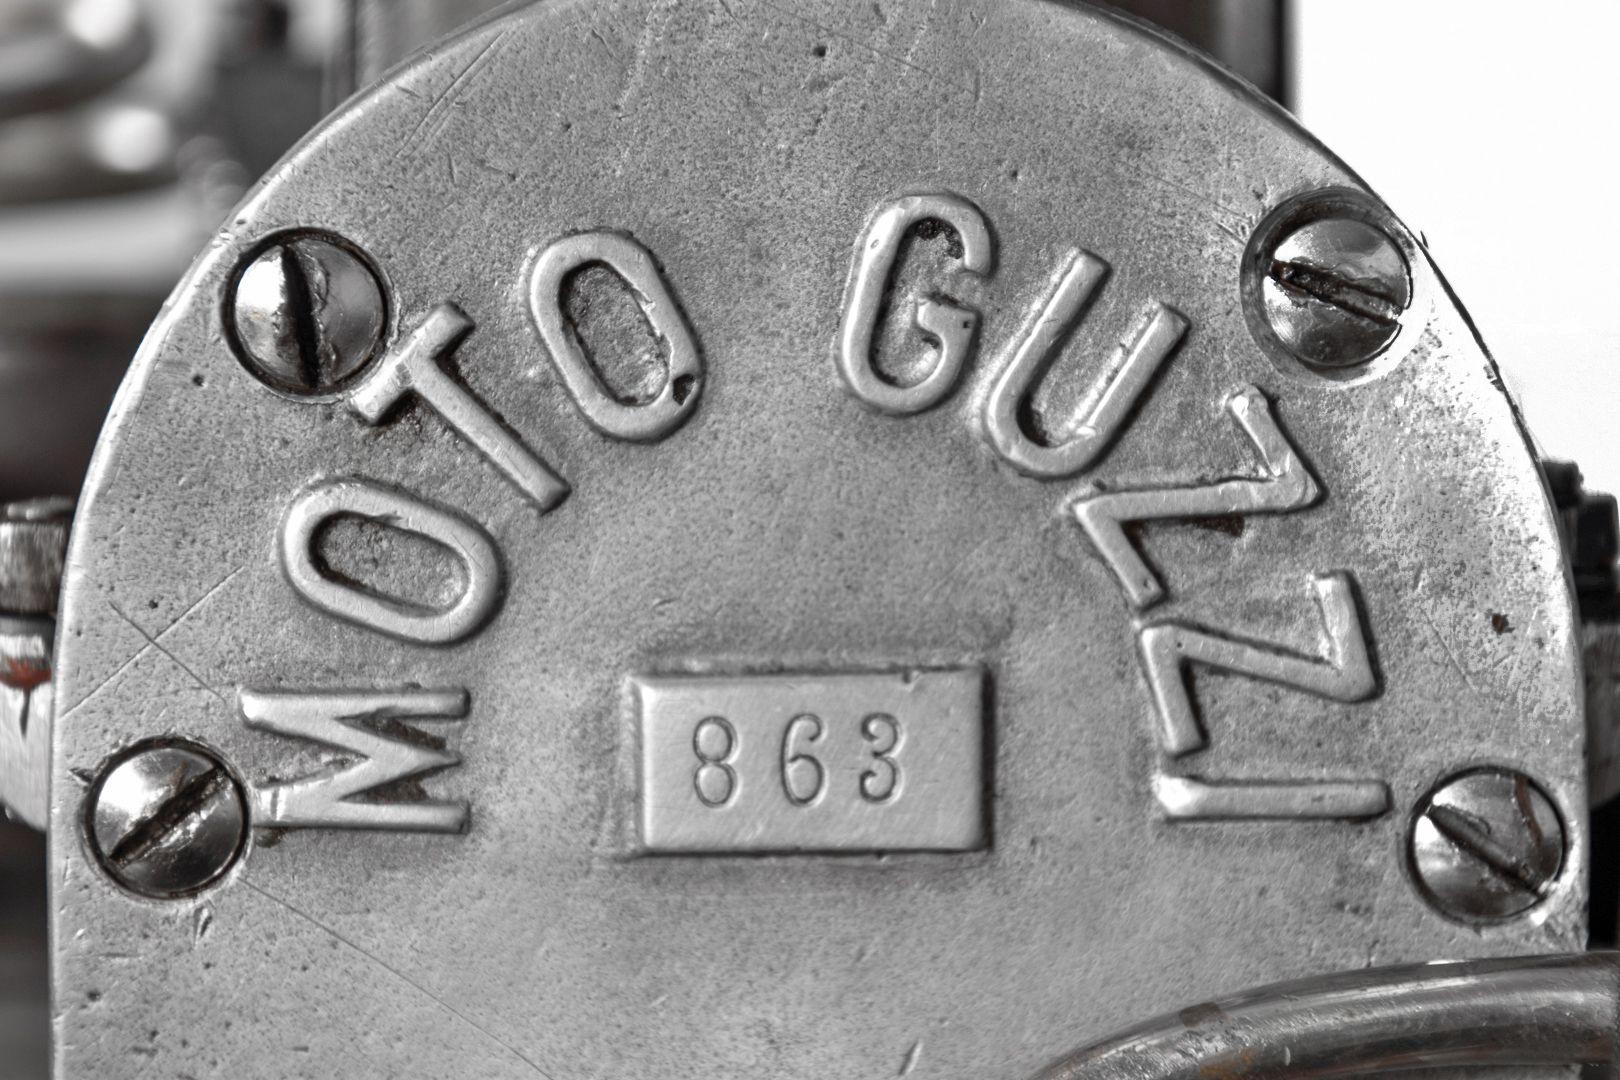 1924 Moto Guzzi 500 Normale 36480